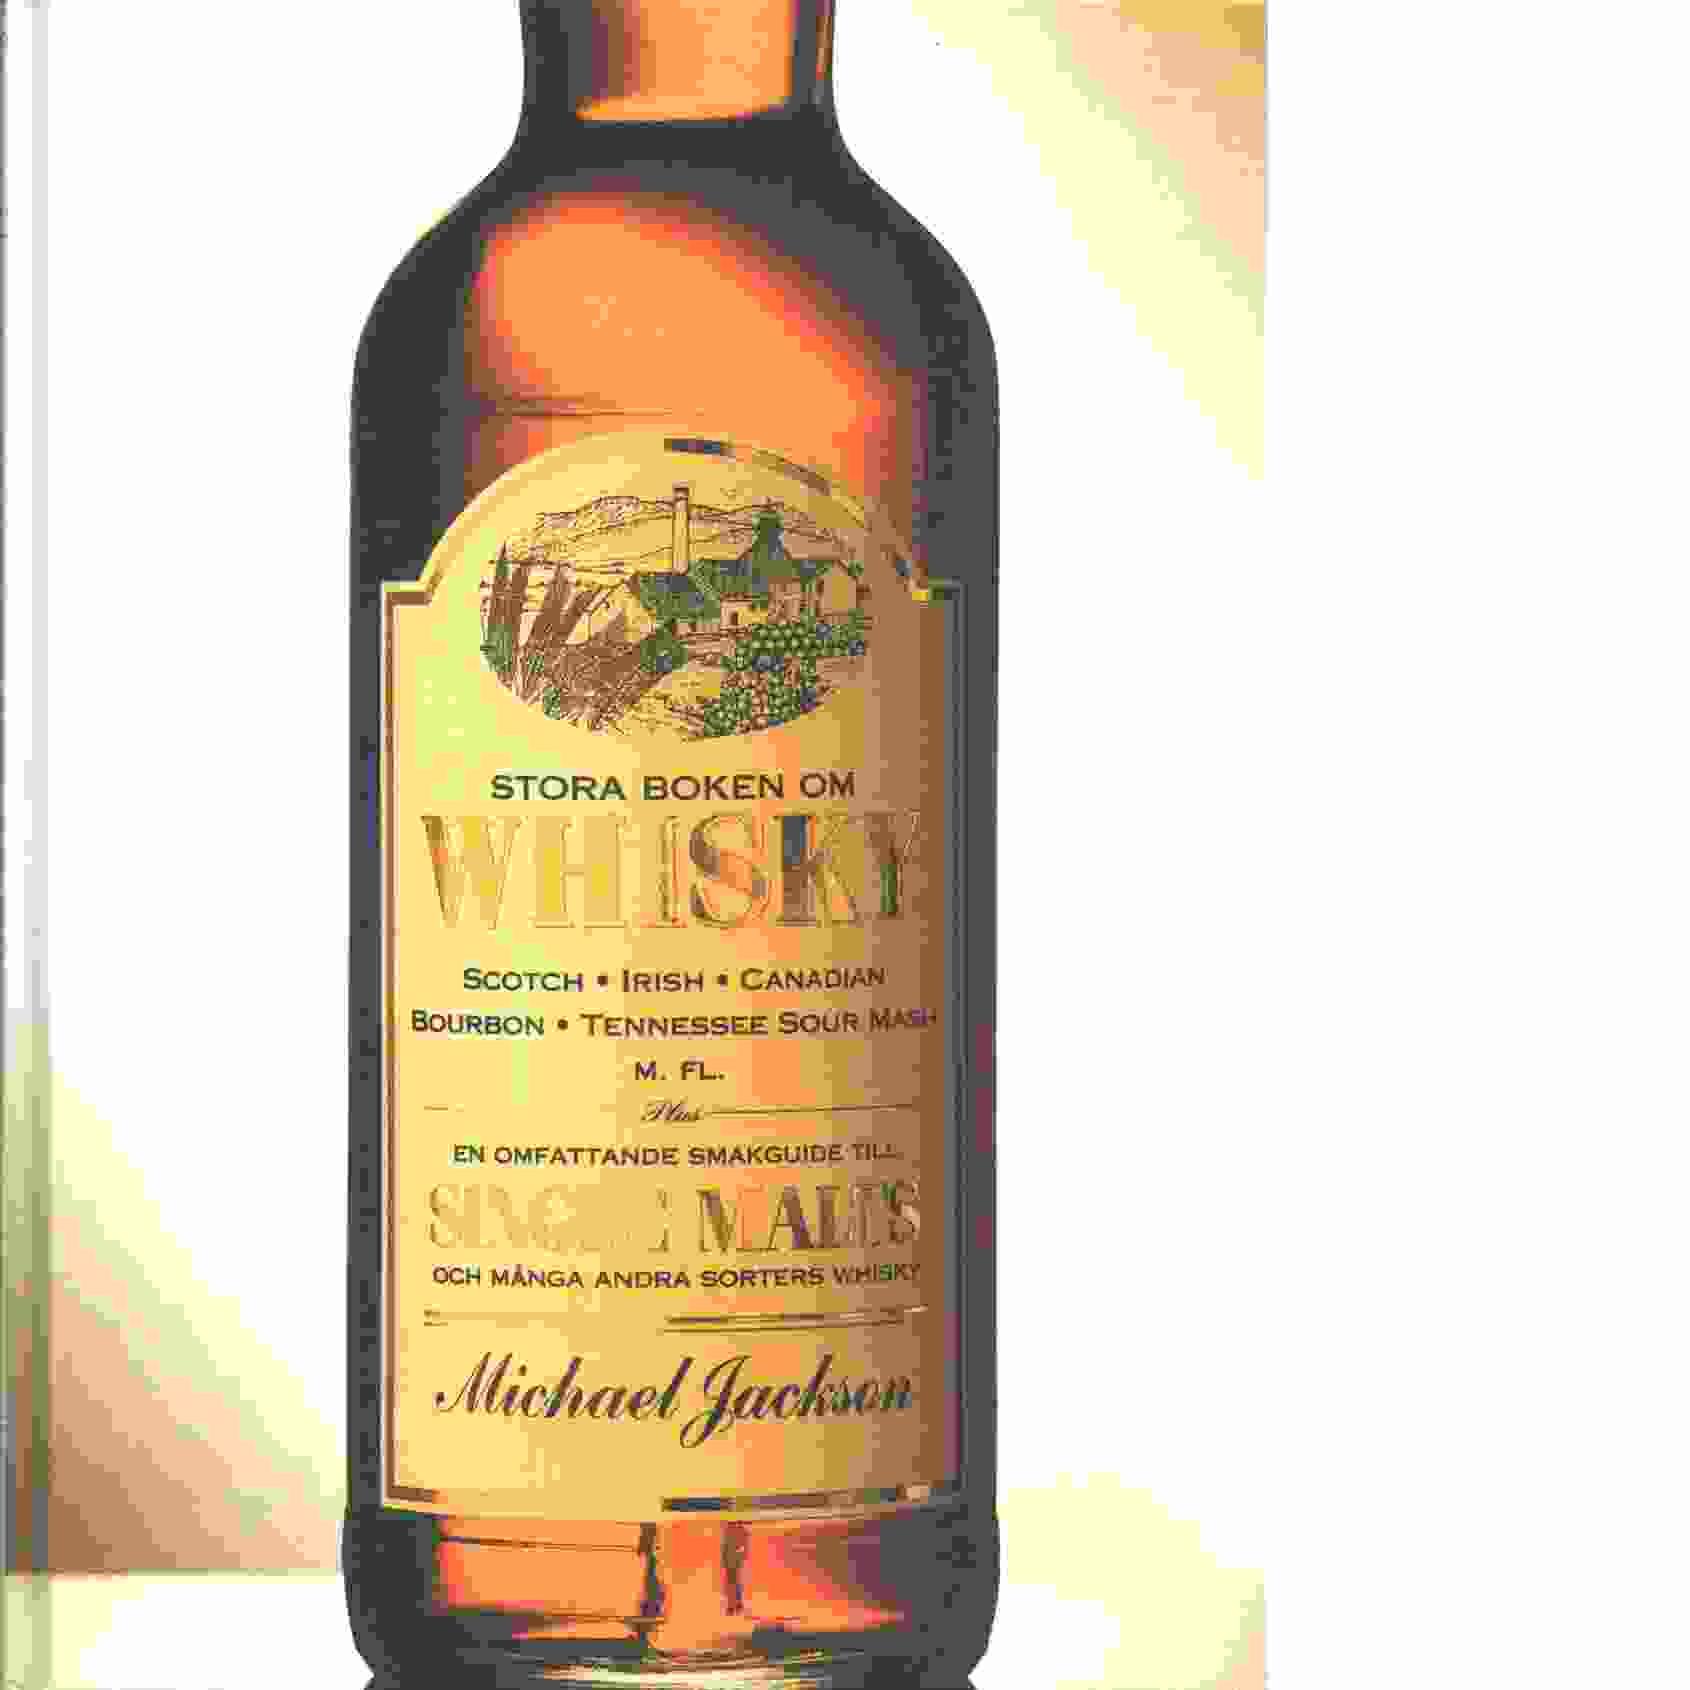 Stora boken om whisky : Scotch, Irish, Canadian, Bourbon, Tennessee sour mash m. fl. : plus en omfattande smakguide till single malts och många andra sorters whisky - Jackson, Michael